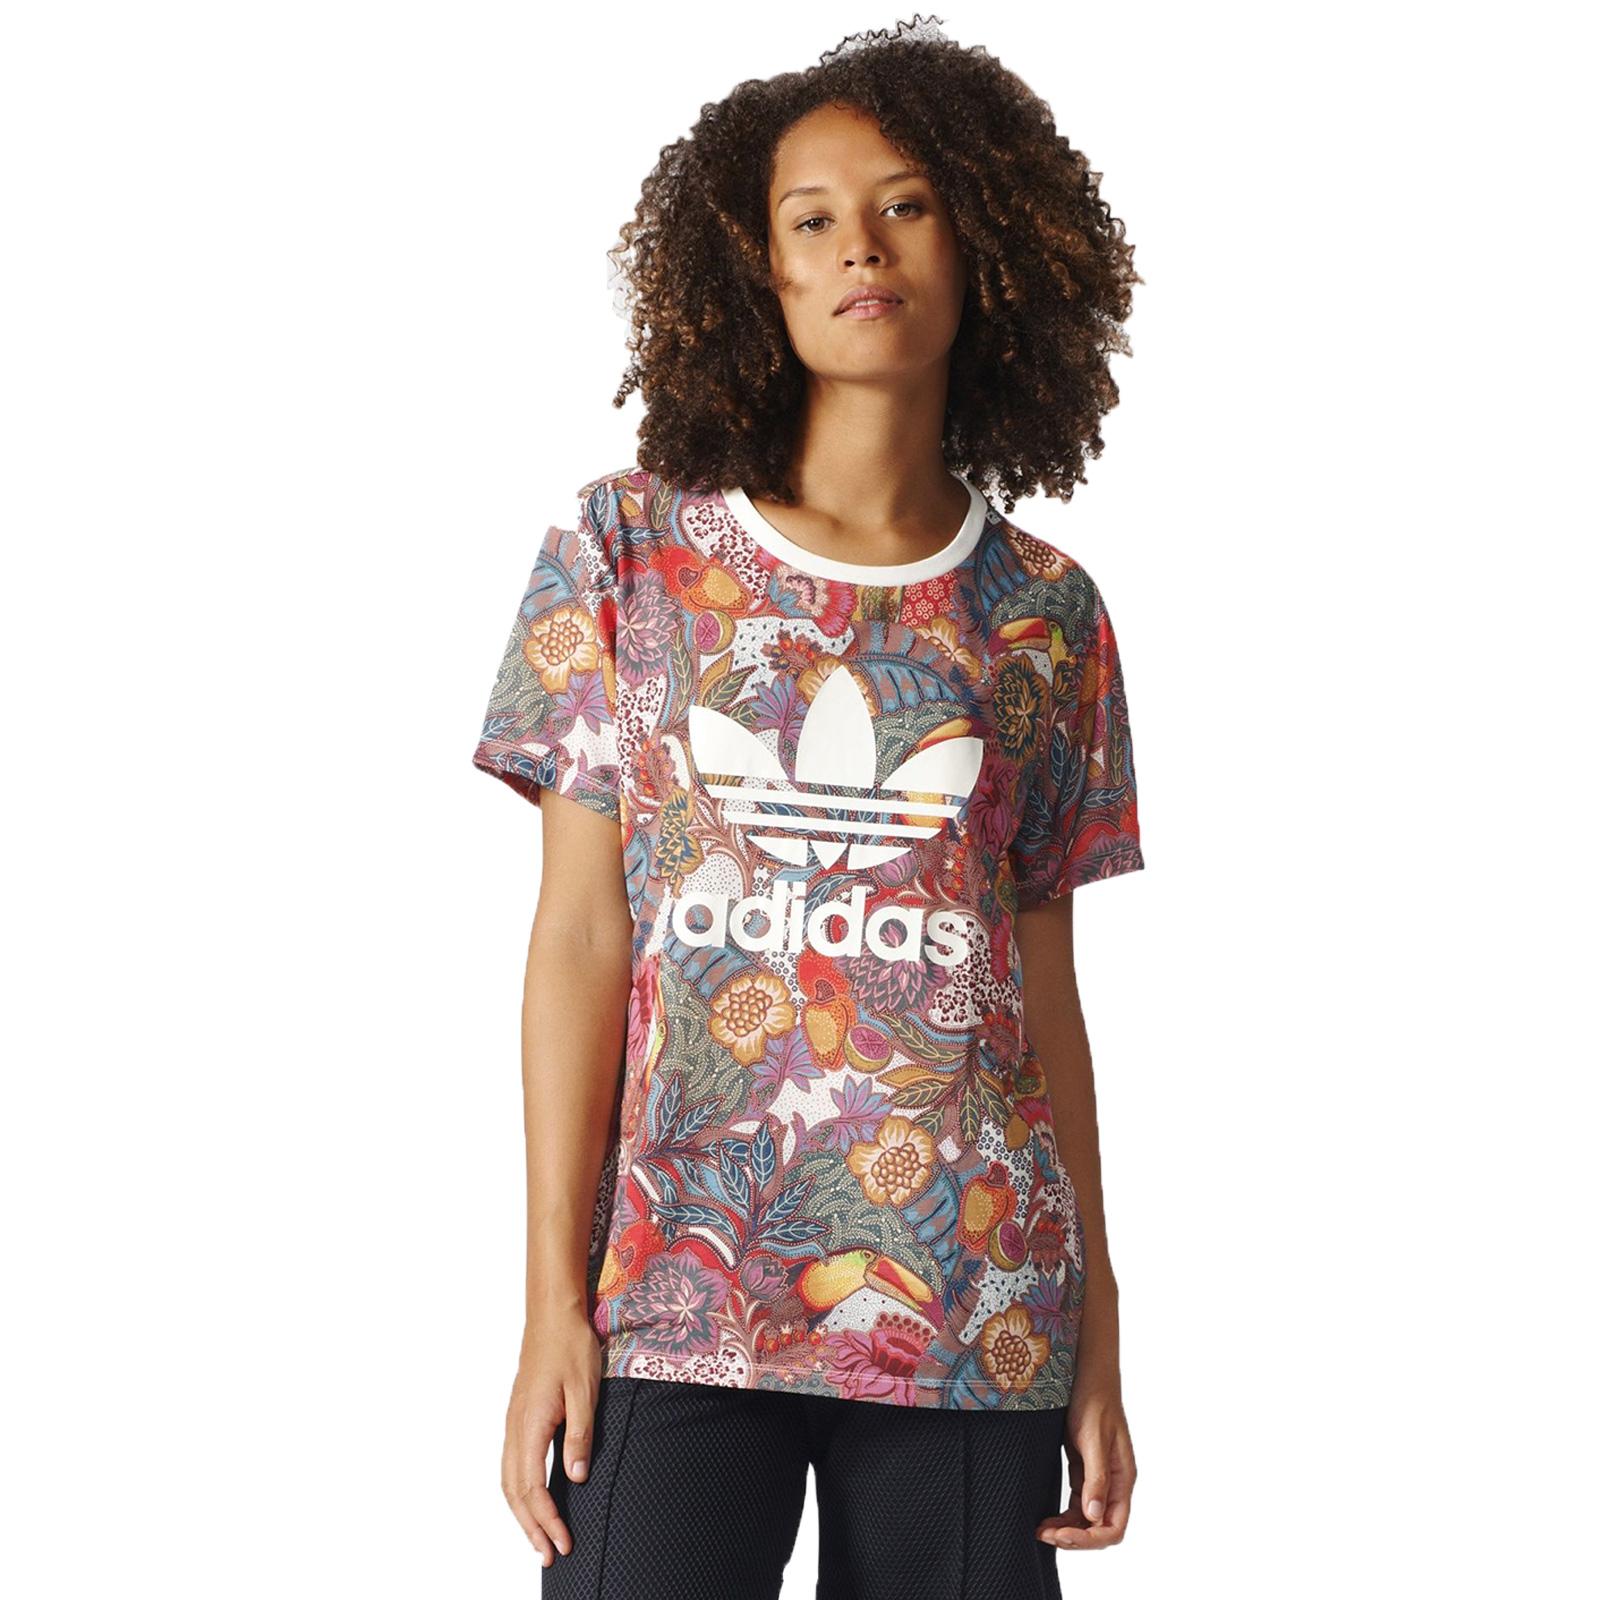 Farm Shirt Company Fugiprabali Femmes Détails Oversize Sur Original Tee T The Adidas X m8w0OvNn